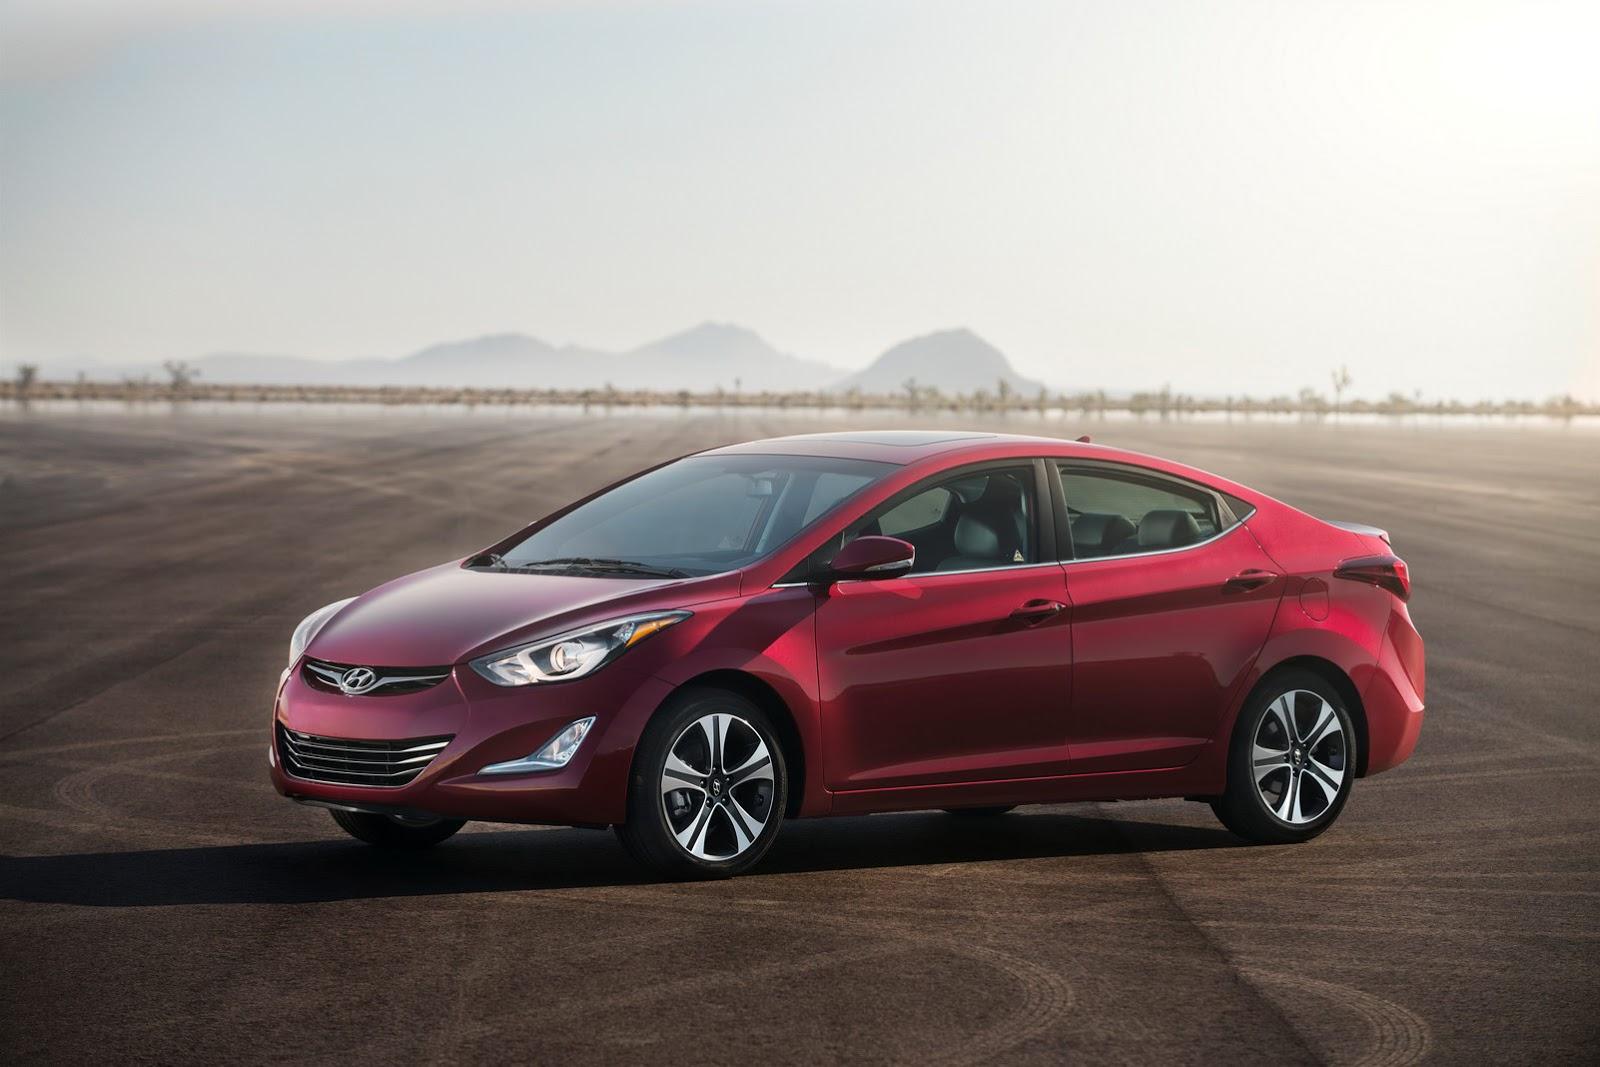 2013 Kia Soul Recalls >> Half A Million Hyundai And Kia Models Recalled Over Brake Light Issue | Carscoops